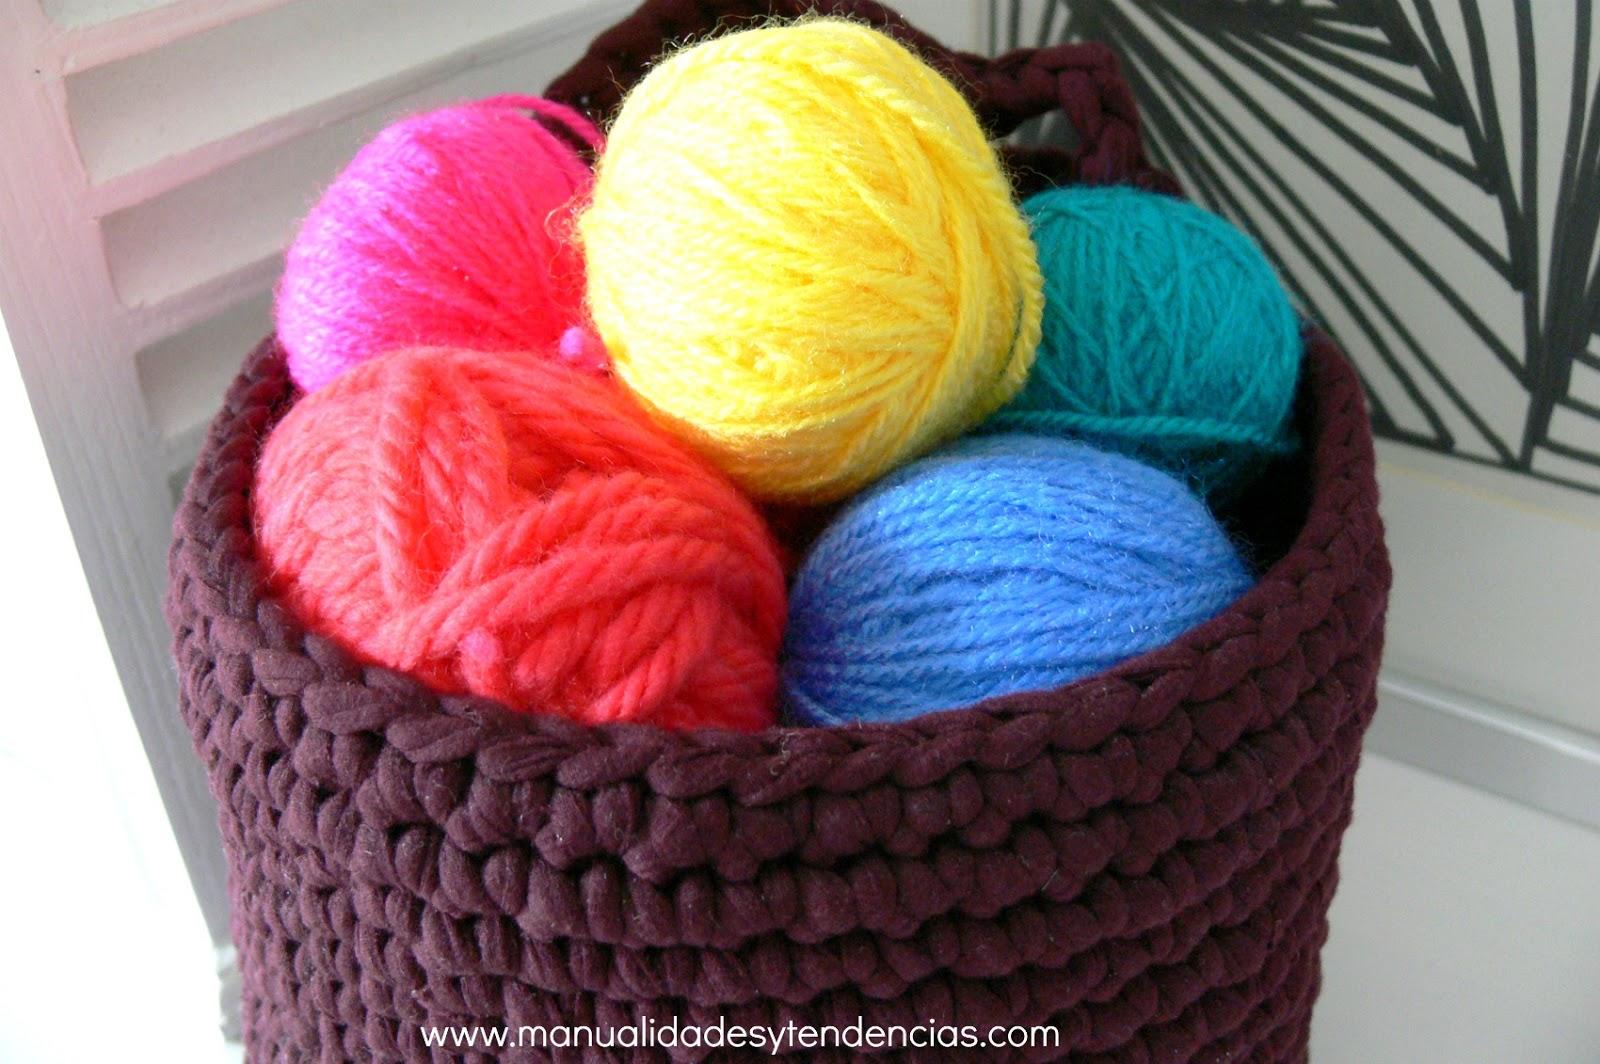 Manualidades y tendencias: Crochet: cesta de trapillo con patrón gratis